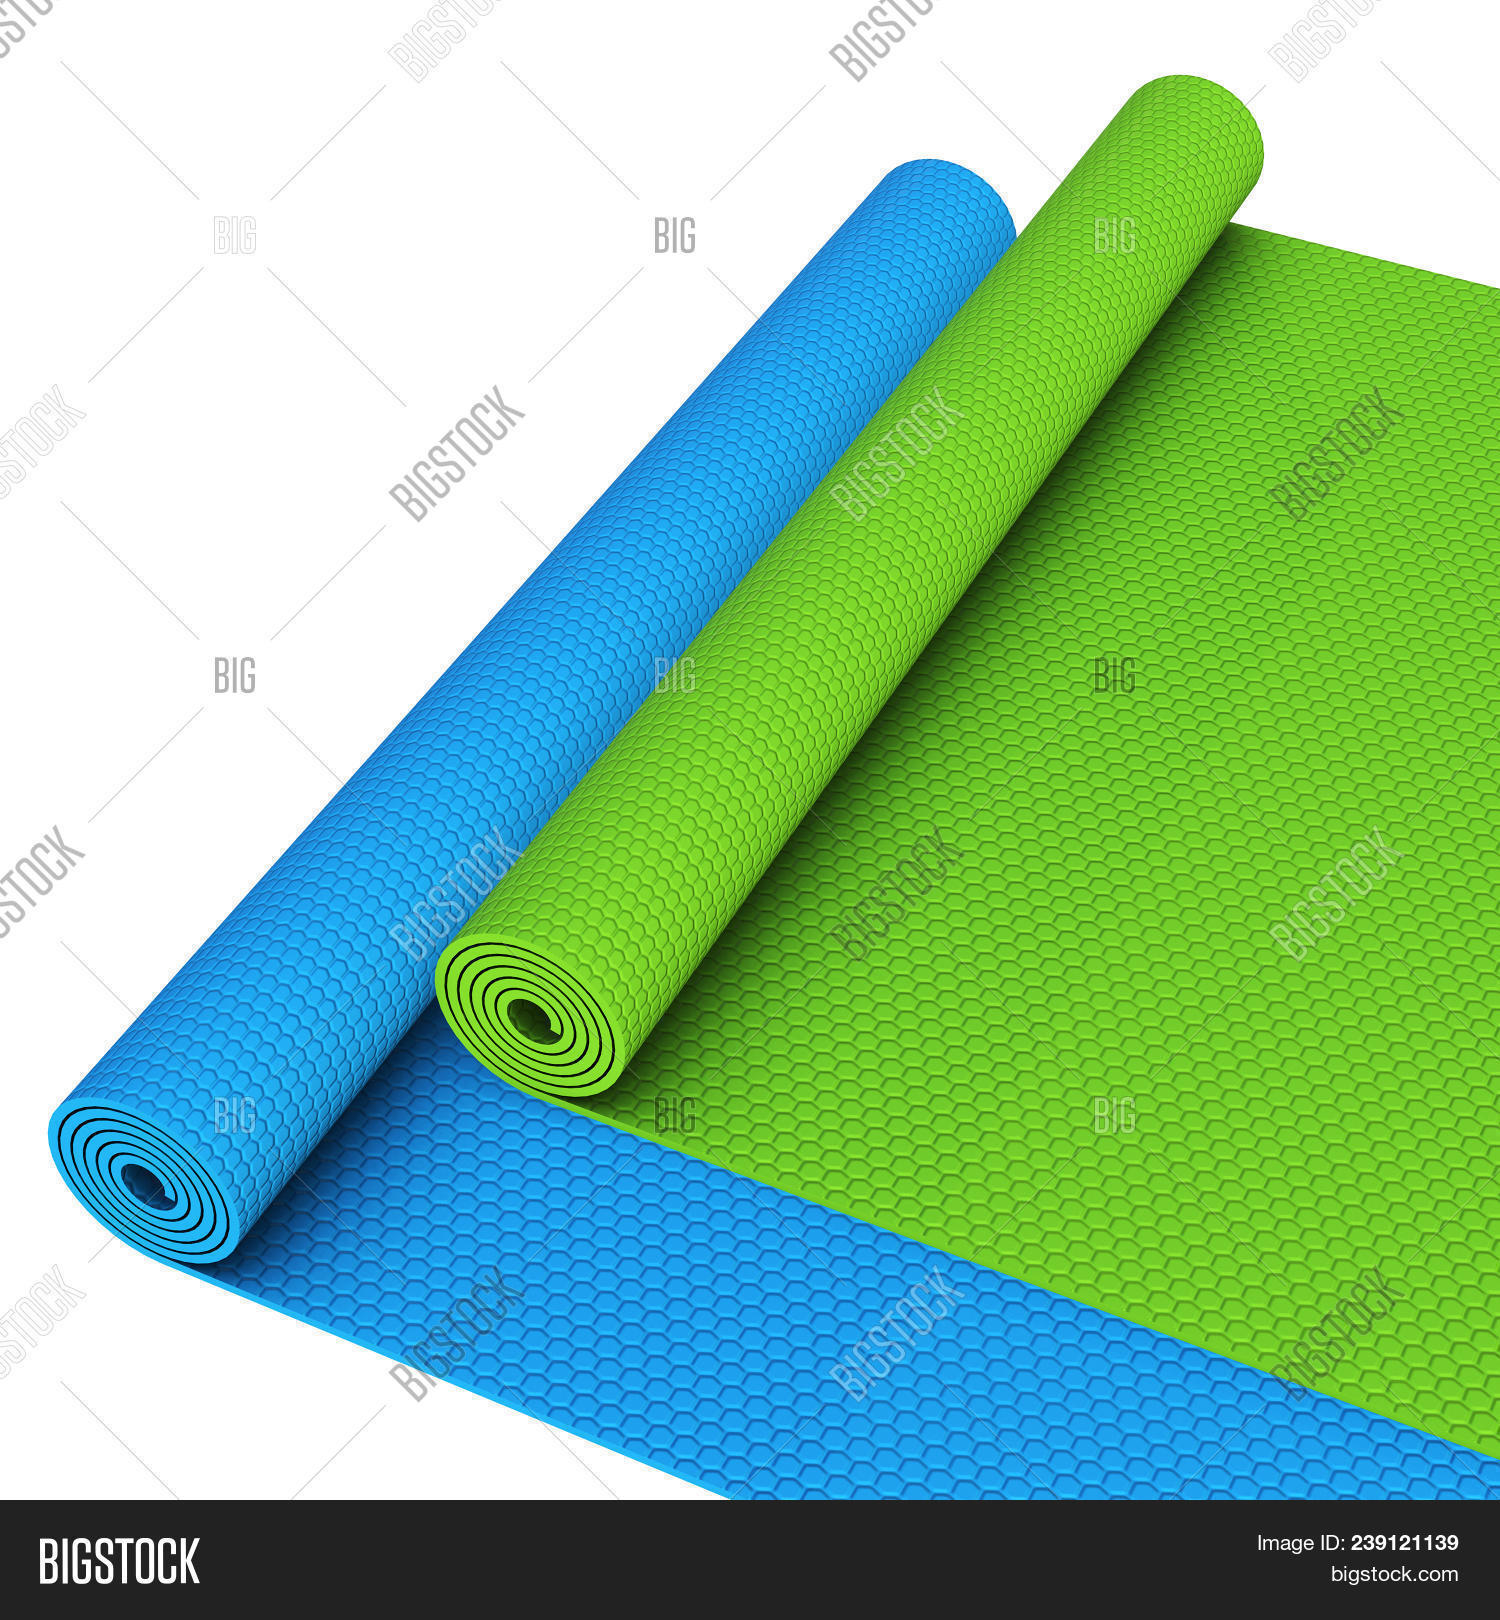 Half Rolled Yoga Image & Photo (Free Trial) | Bigstock